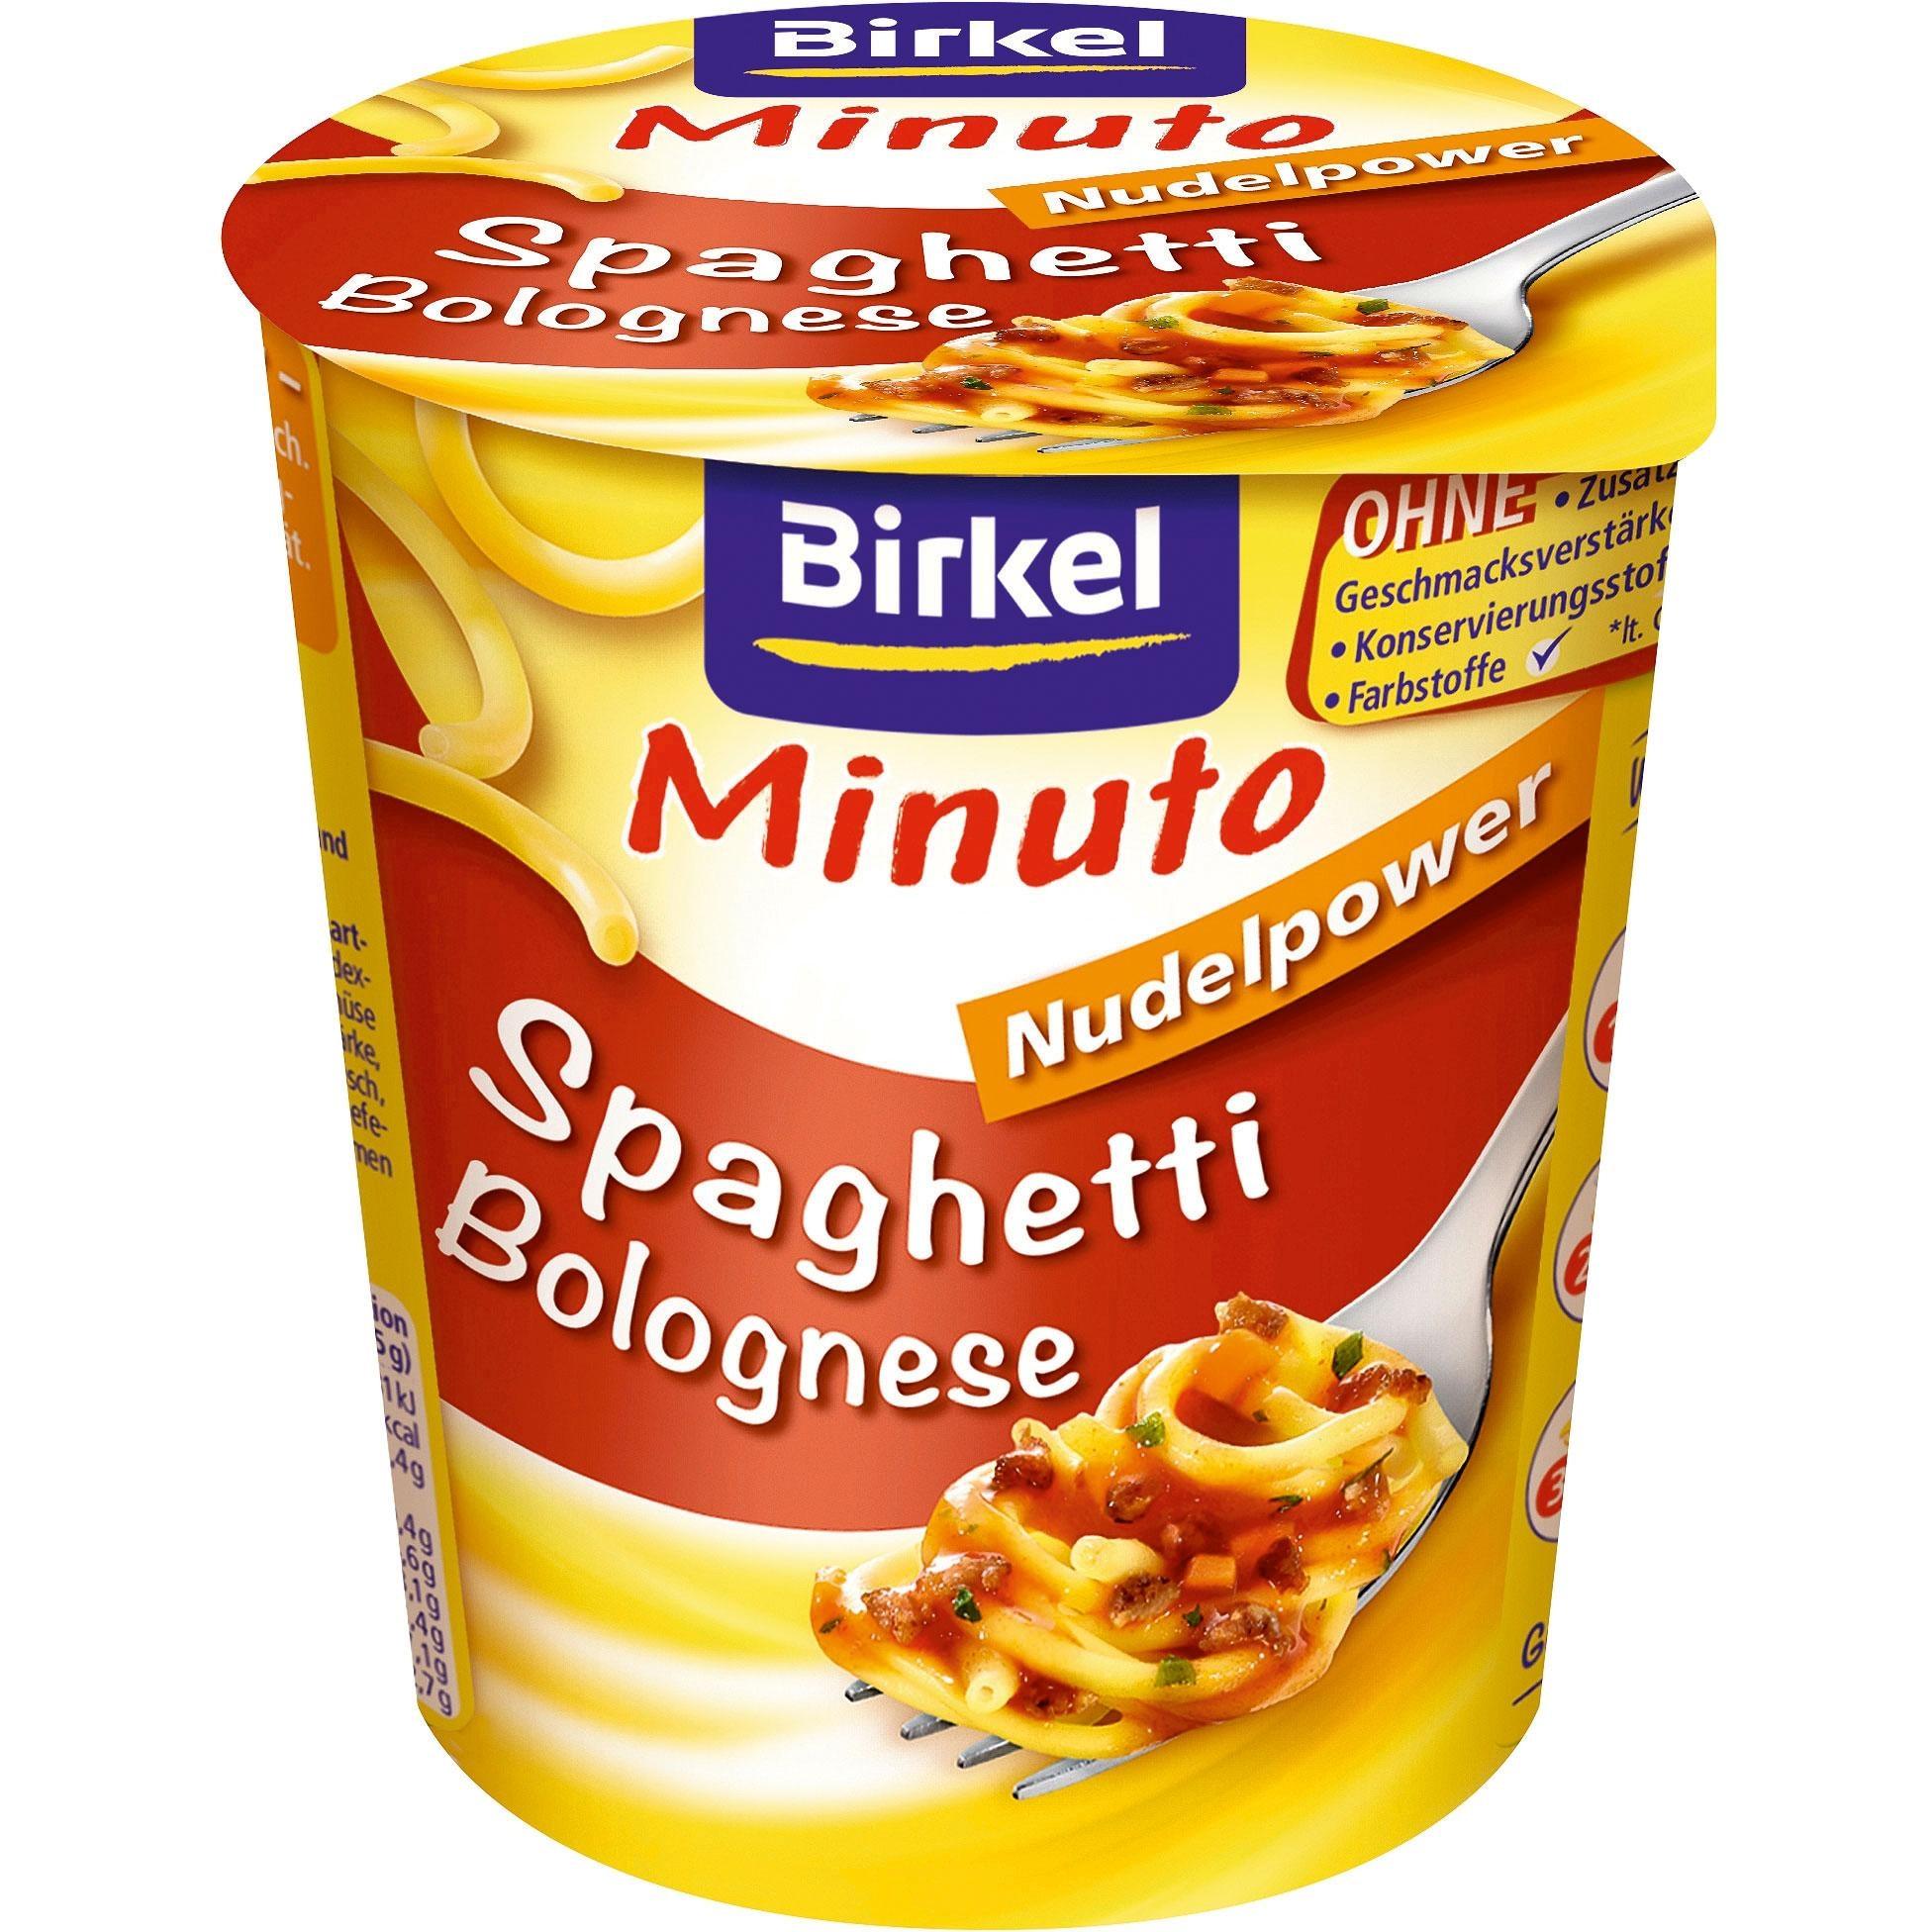 Birkel - Minuto Spaghetti Bolognese - 59,5g